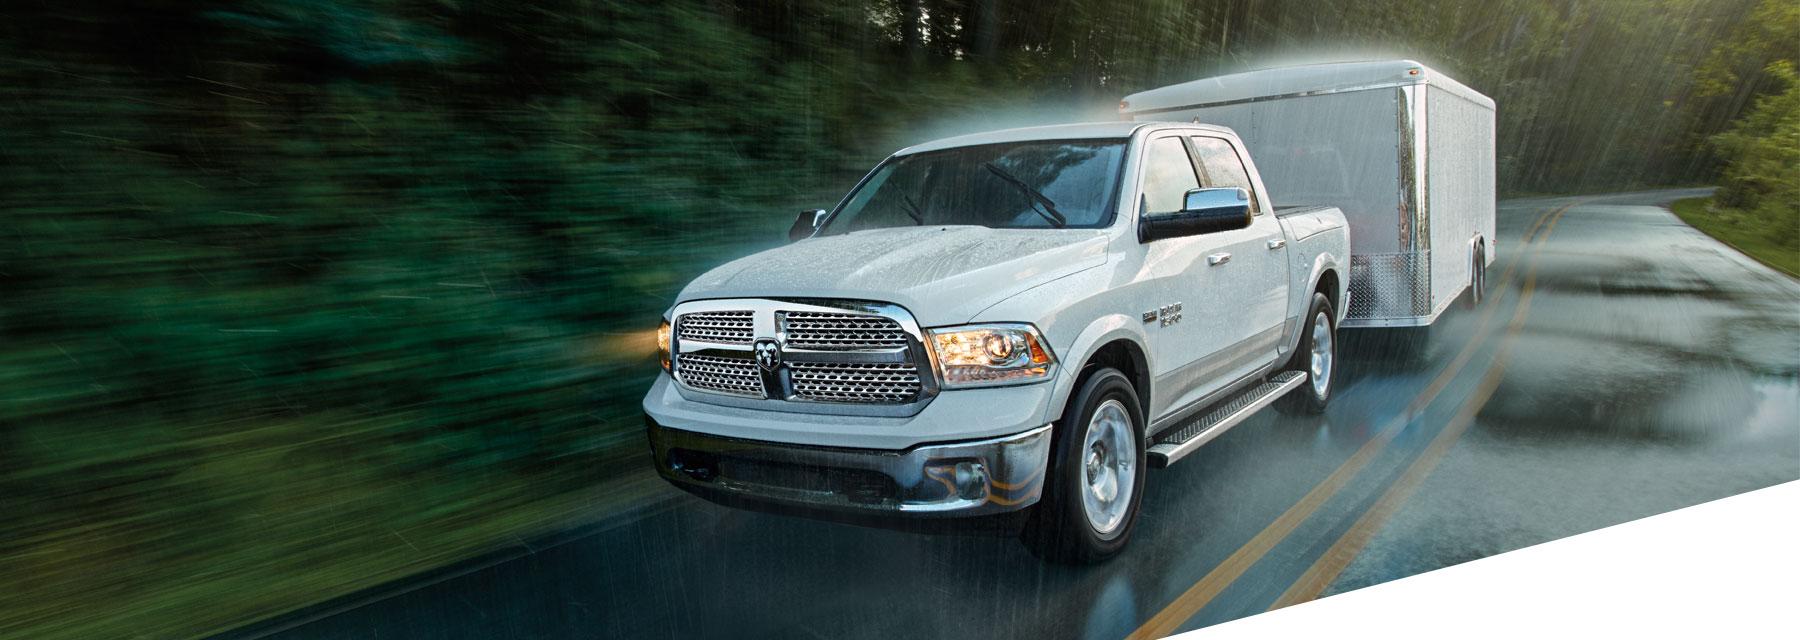 Ram 1500 truck driving rain stability